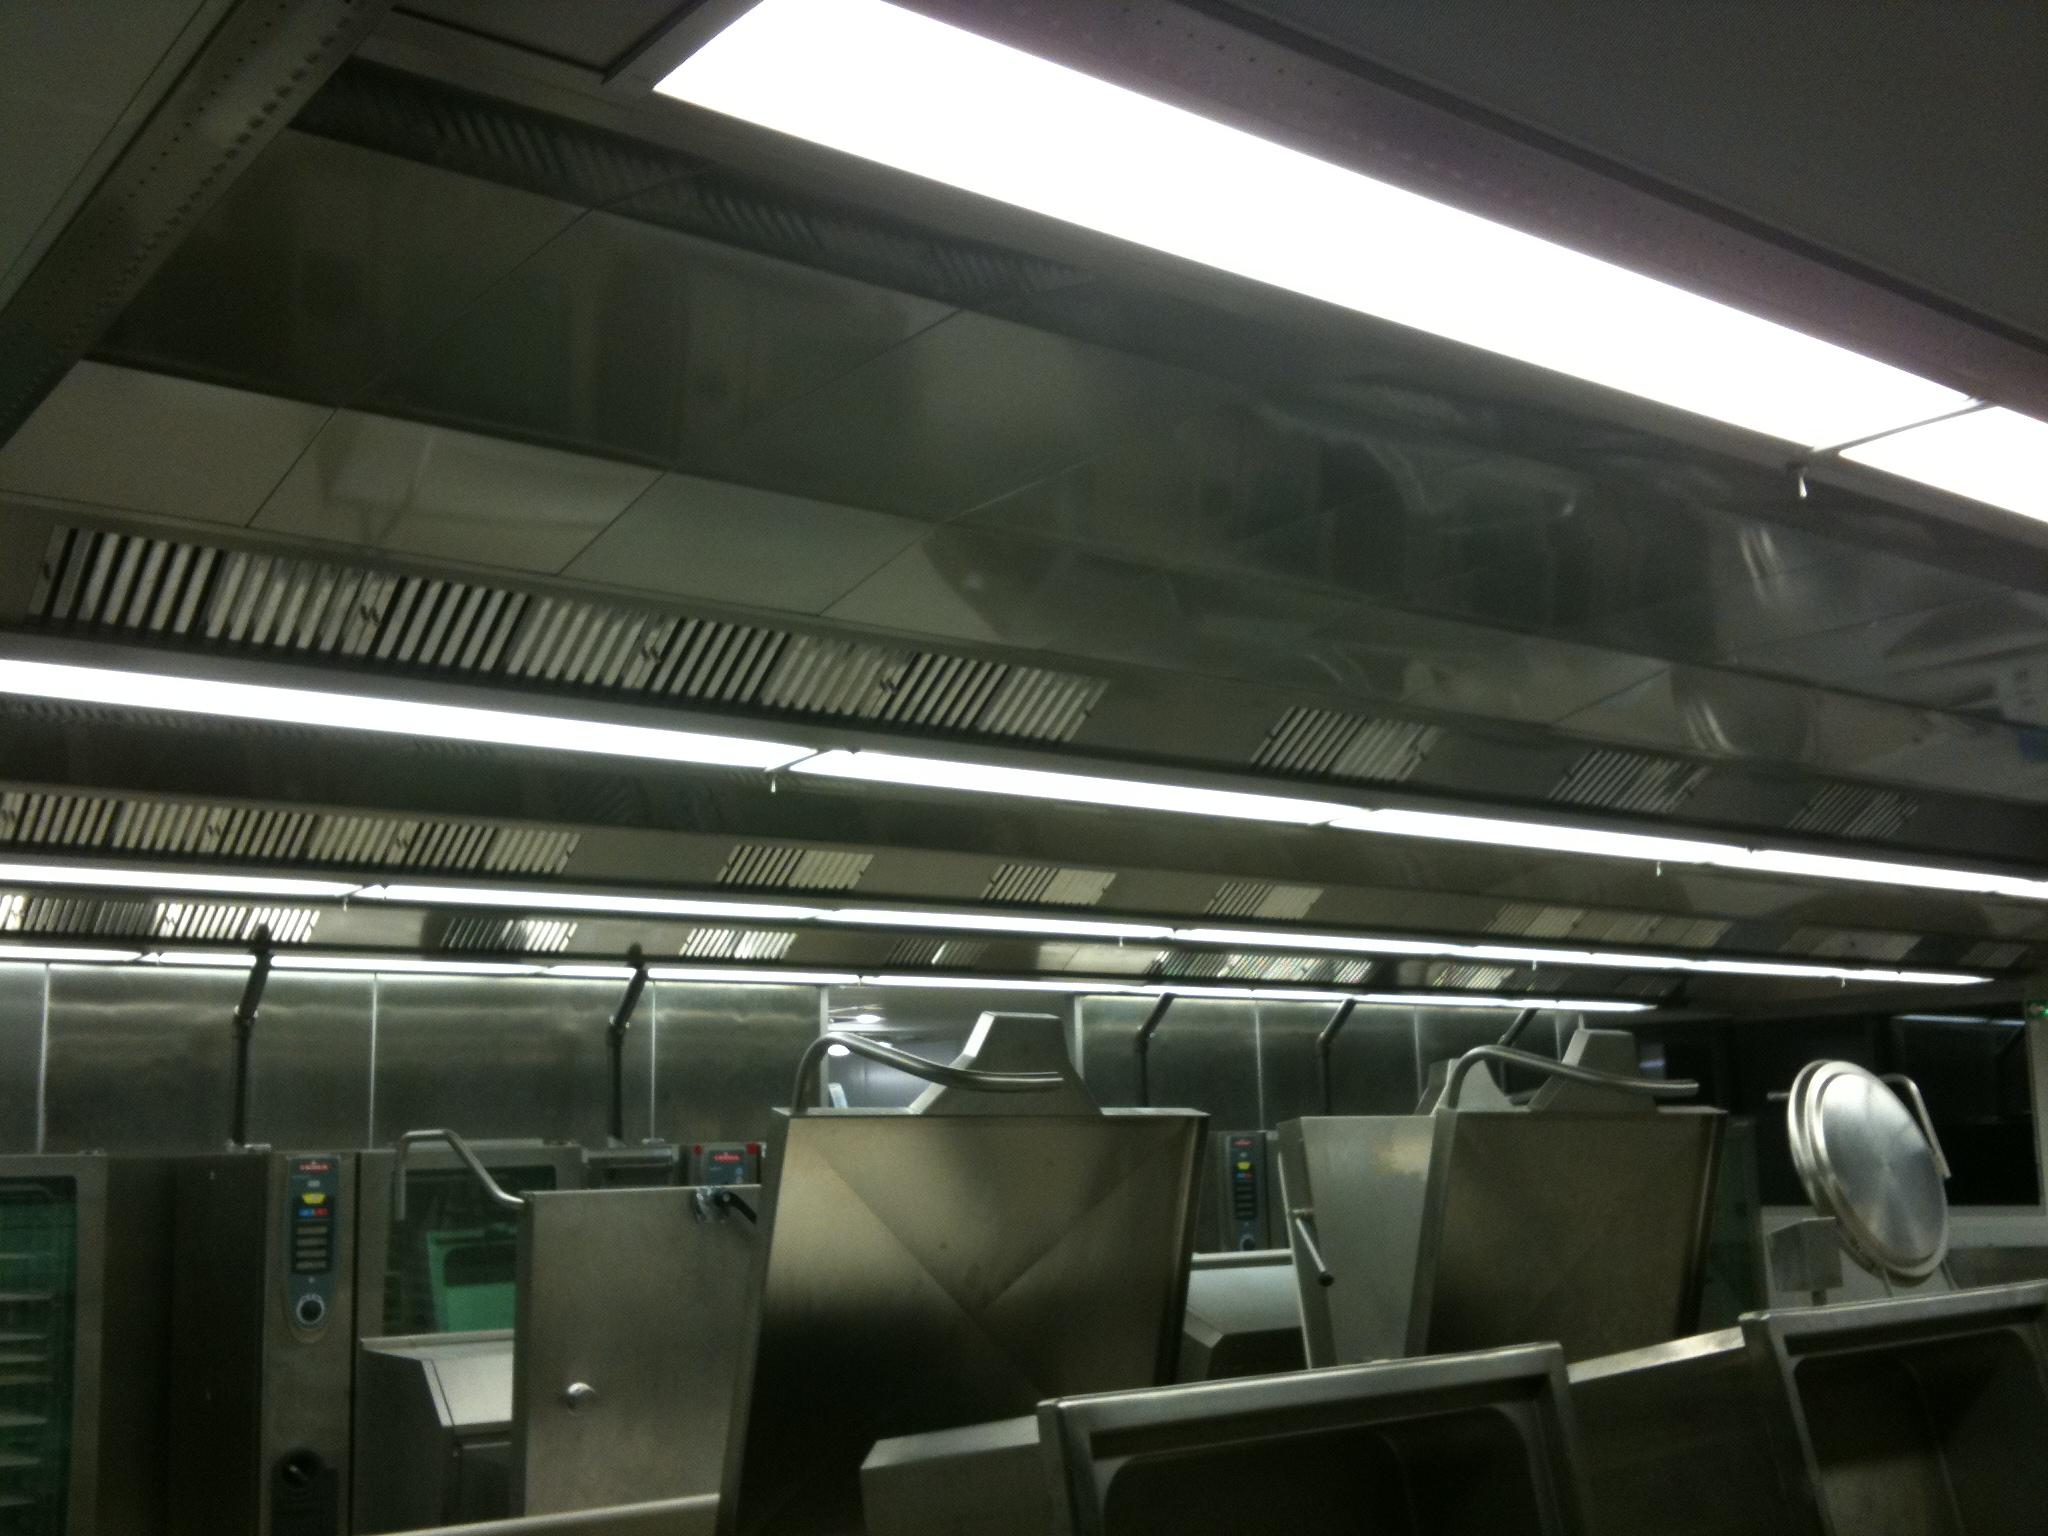 Plafond filtrant cuisine centrale